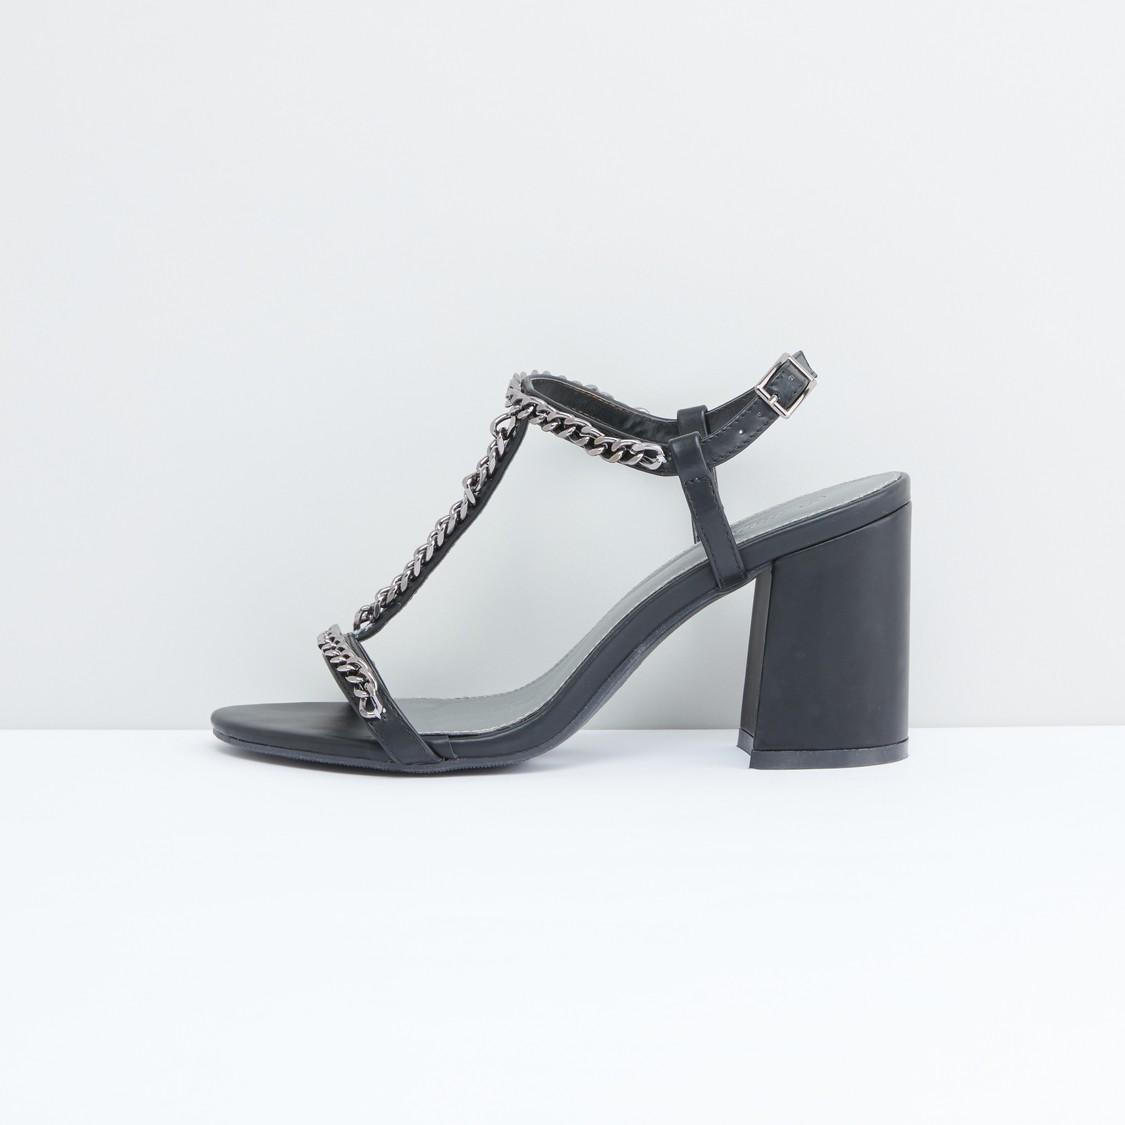 Chain Detail Sandals